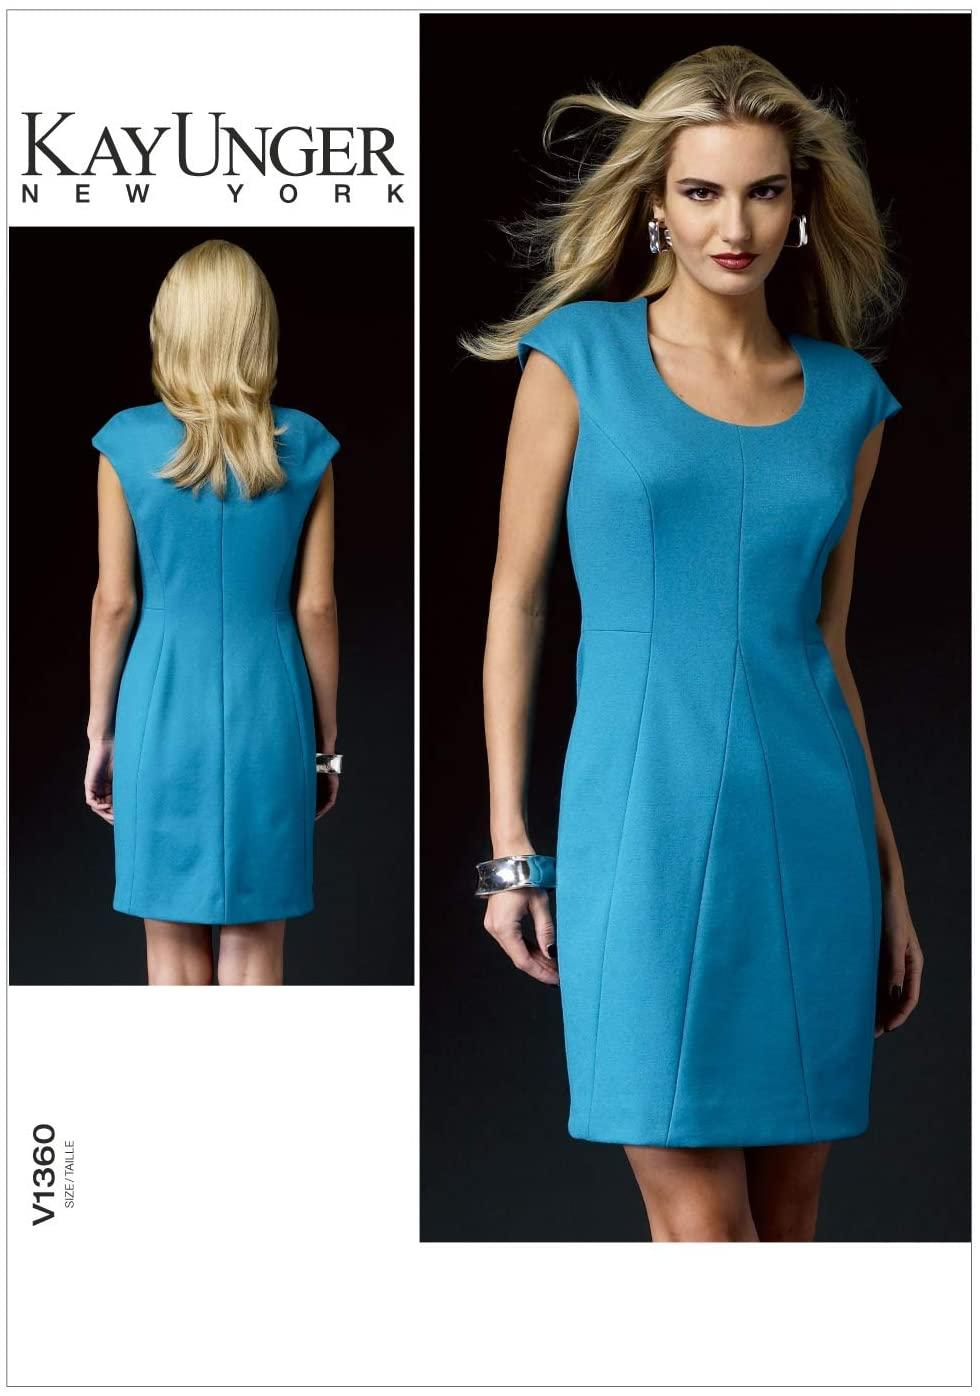 Vogue Patterns V1360 Misses' Dress Sewing Template, Size B5 (8-10-12-14-16)